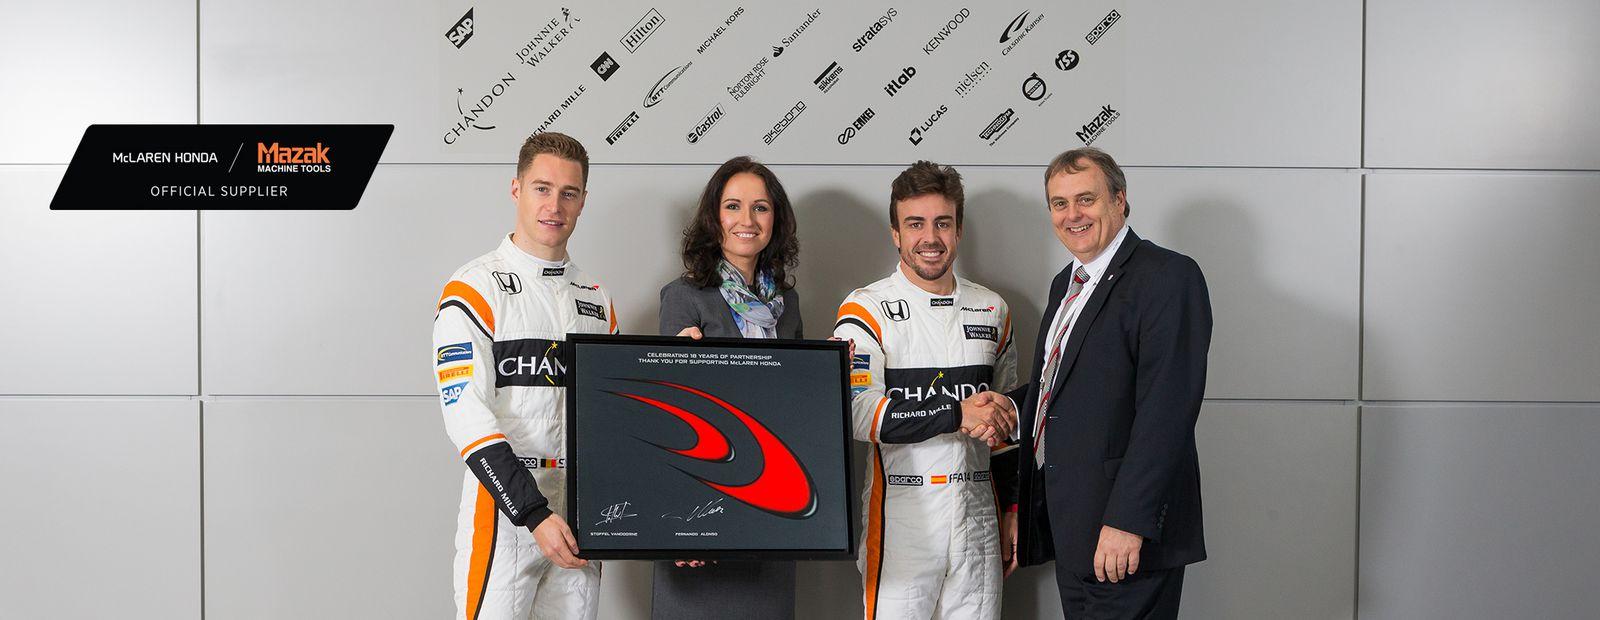 McLaren-Honda extends exclusive machine tool partnership with Mazak